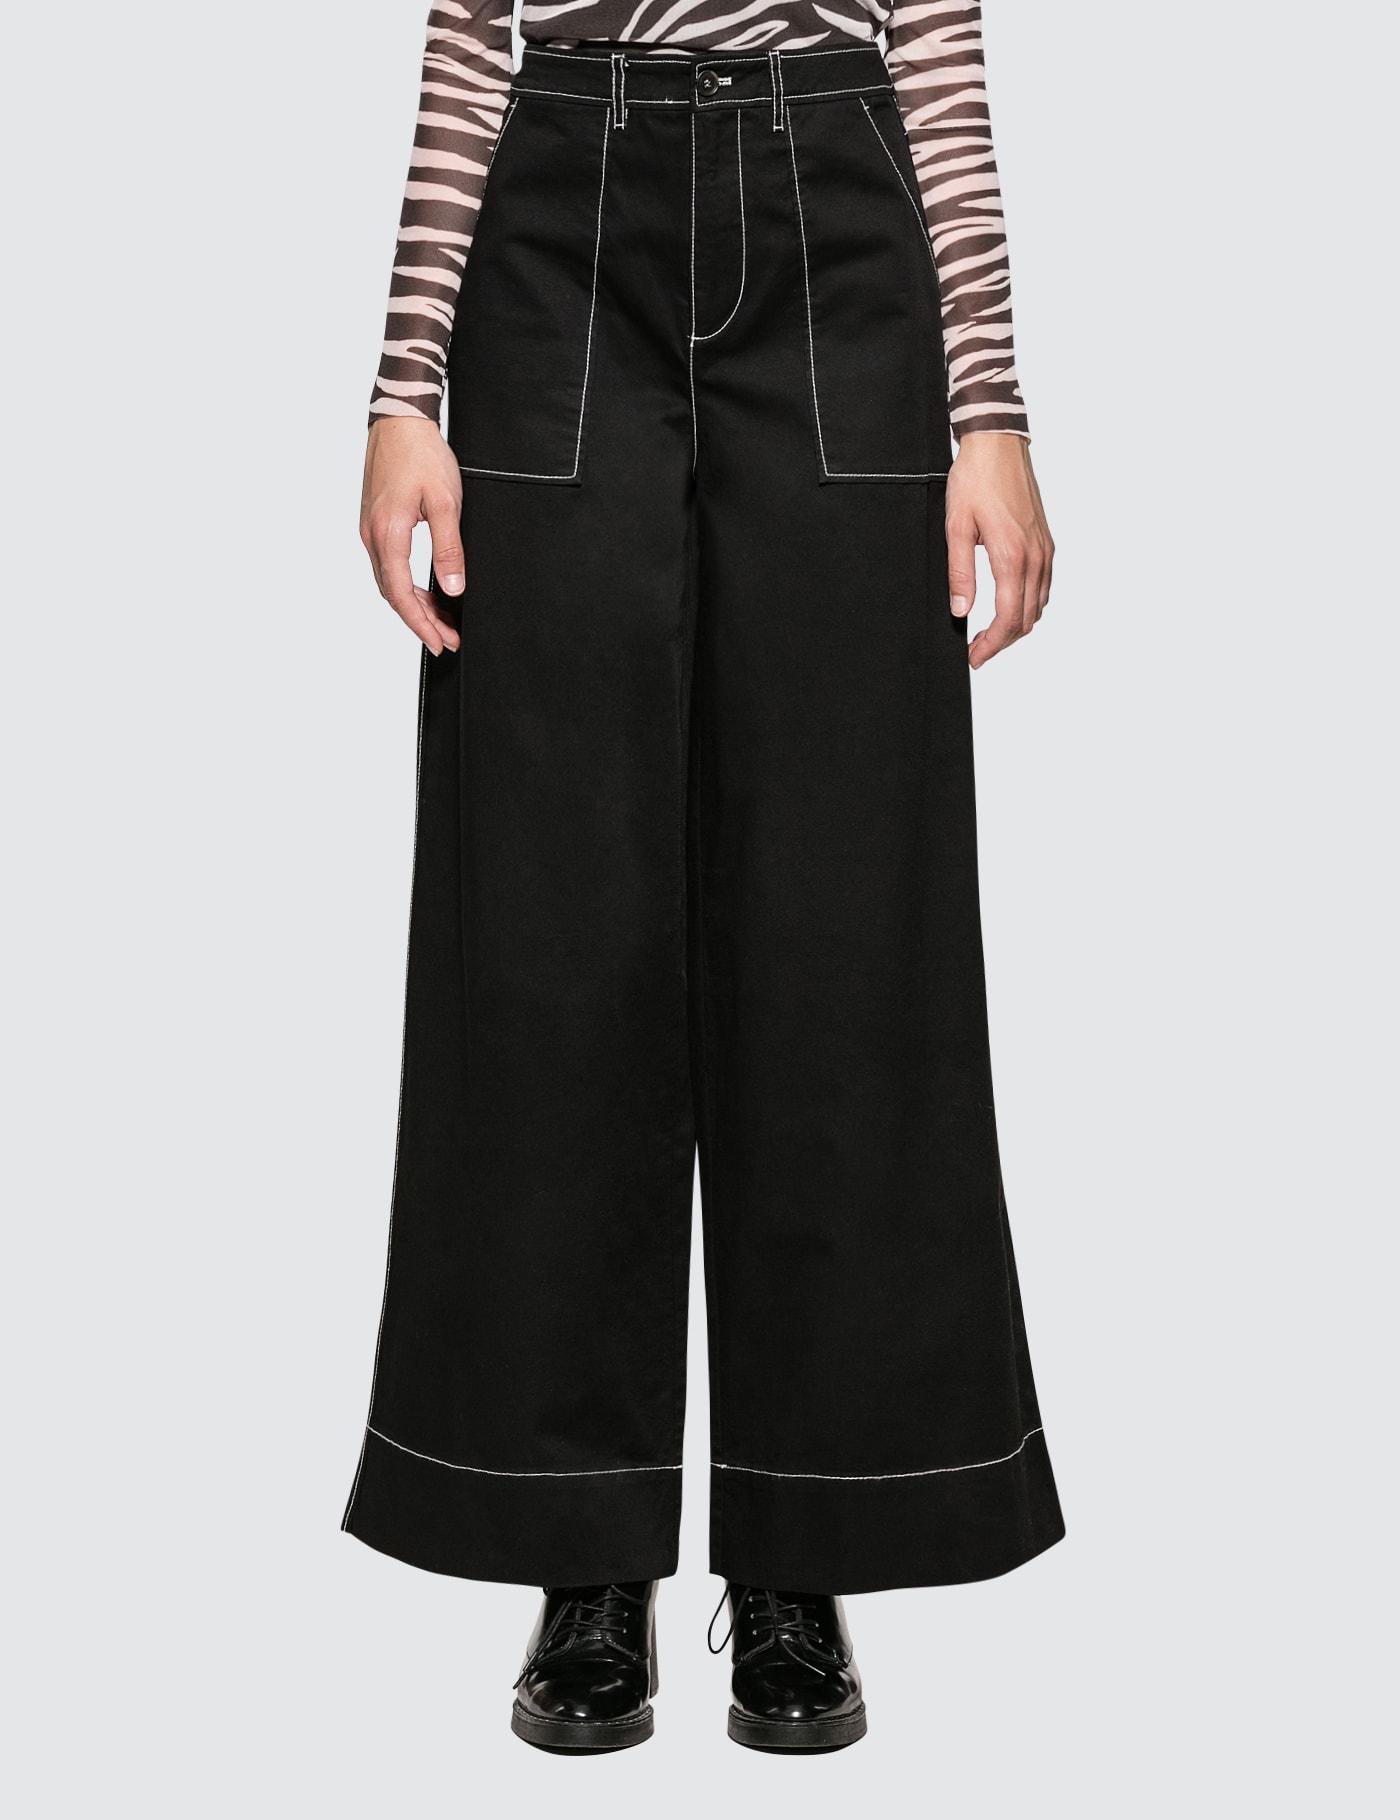 Hewson Pants